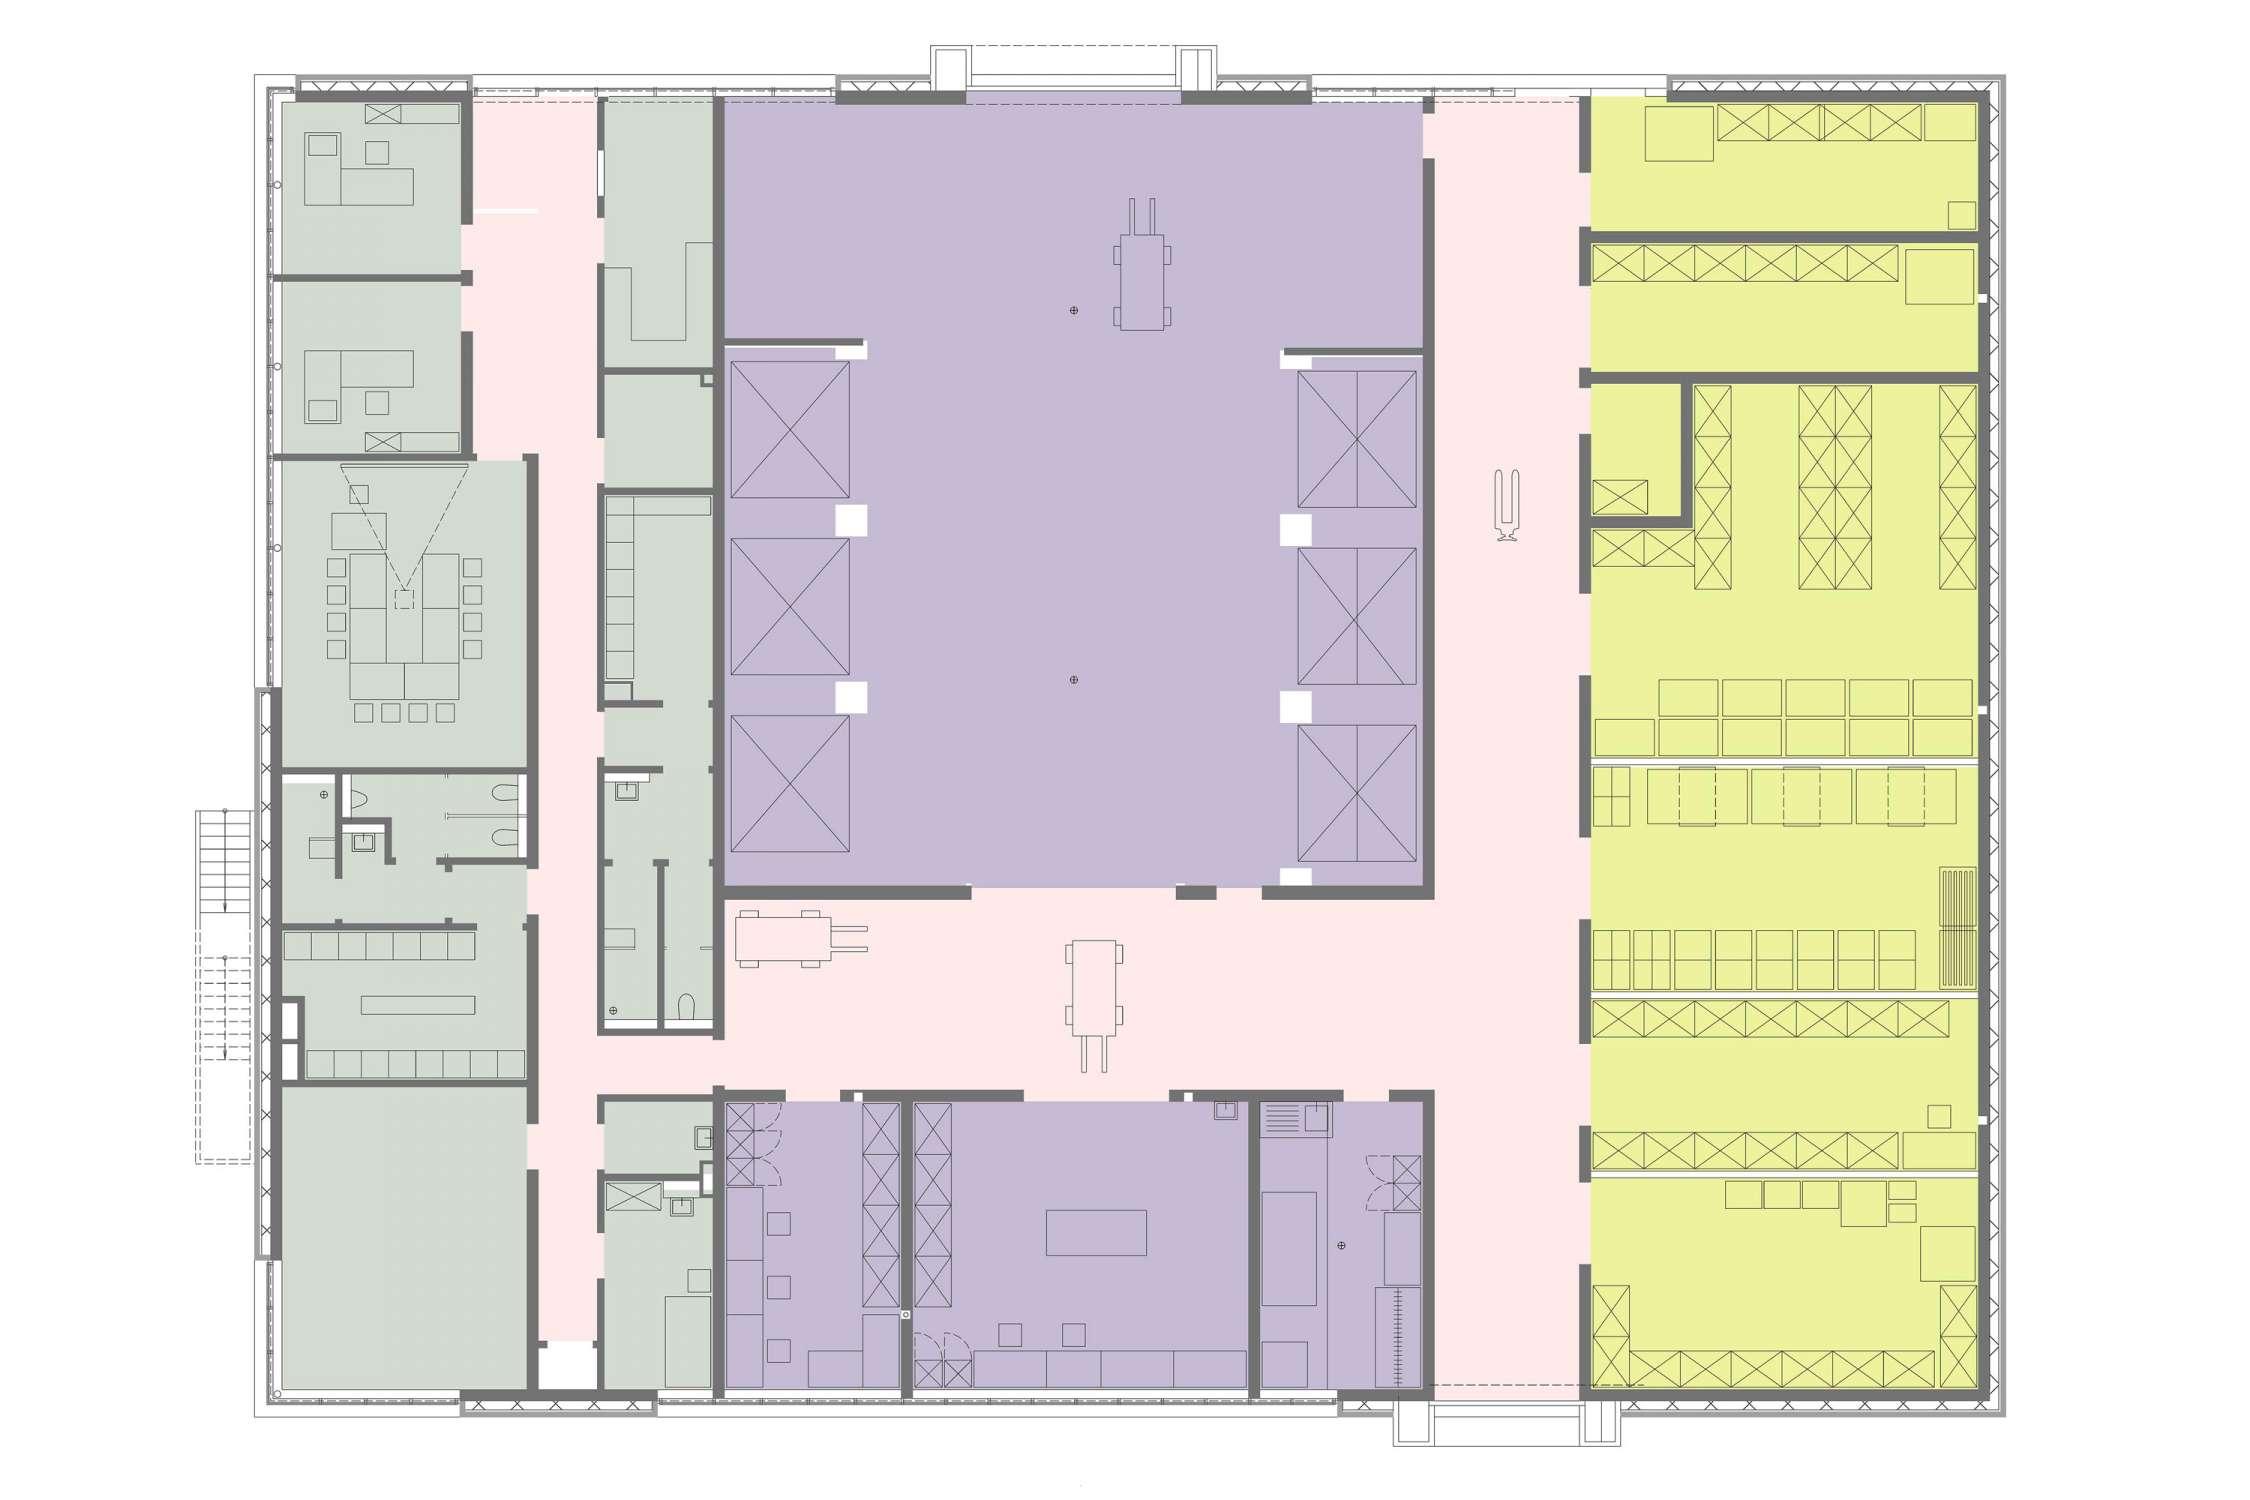 Flugplatz Laupheim, Neubau Lagergebäude (4)